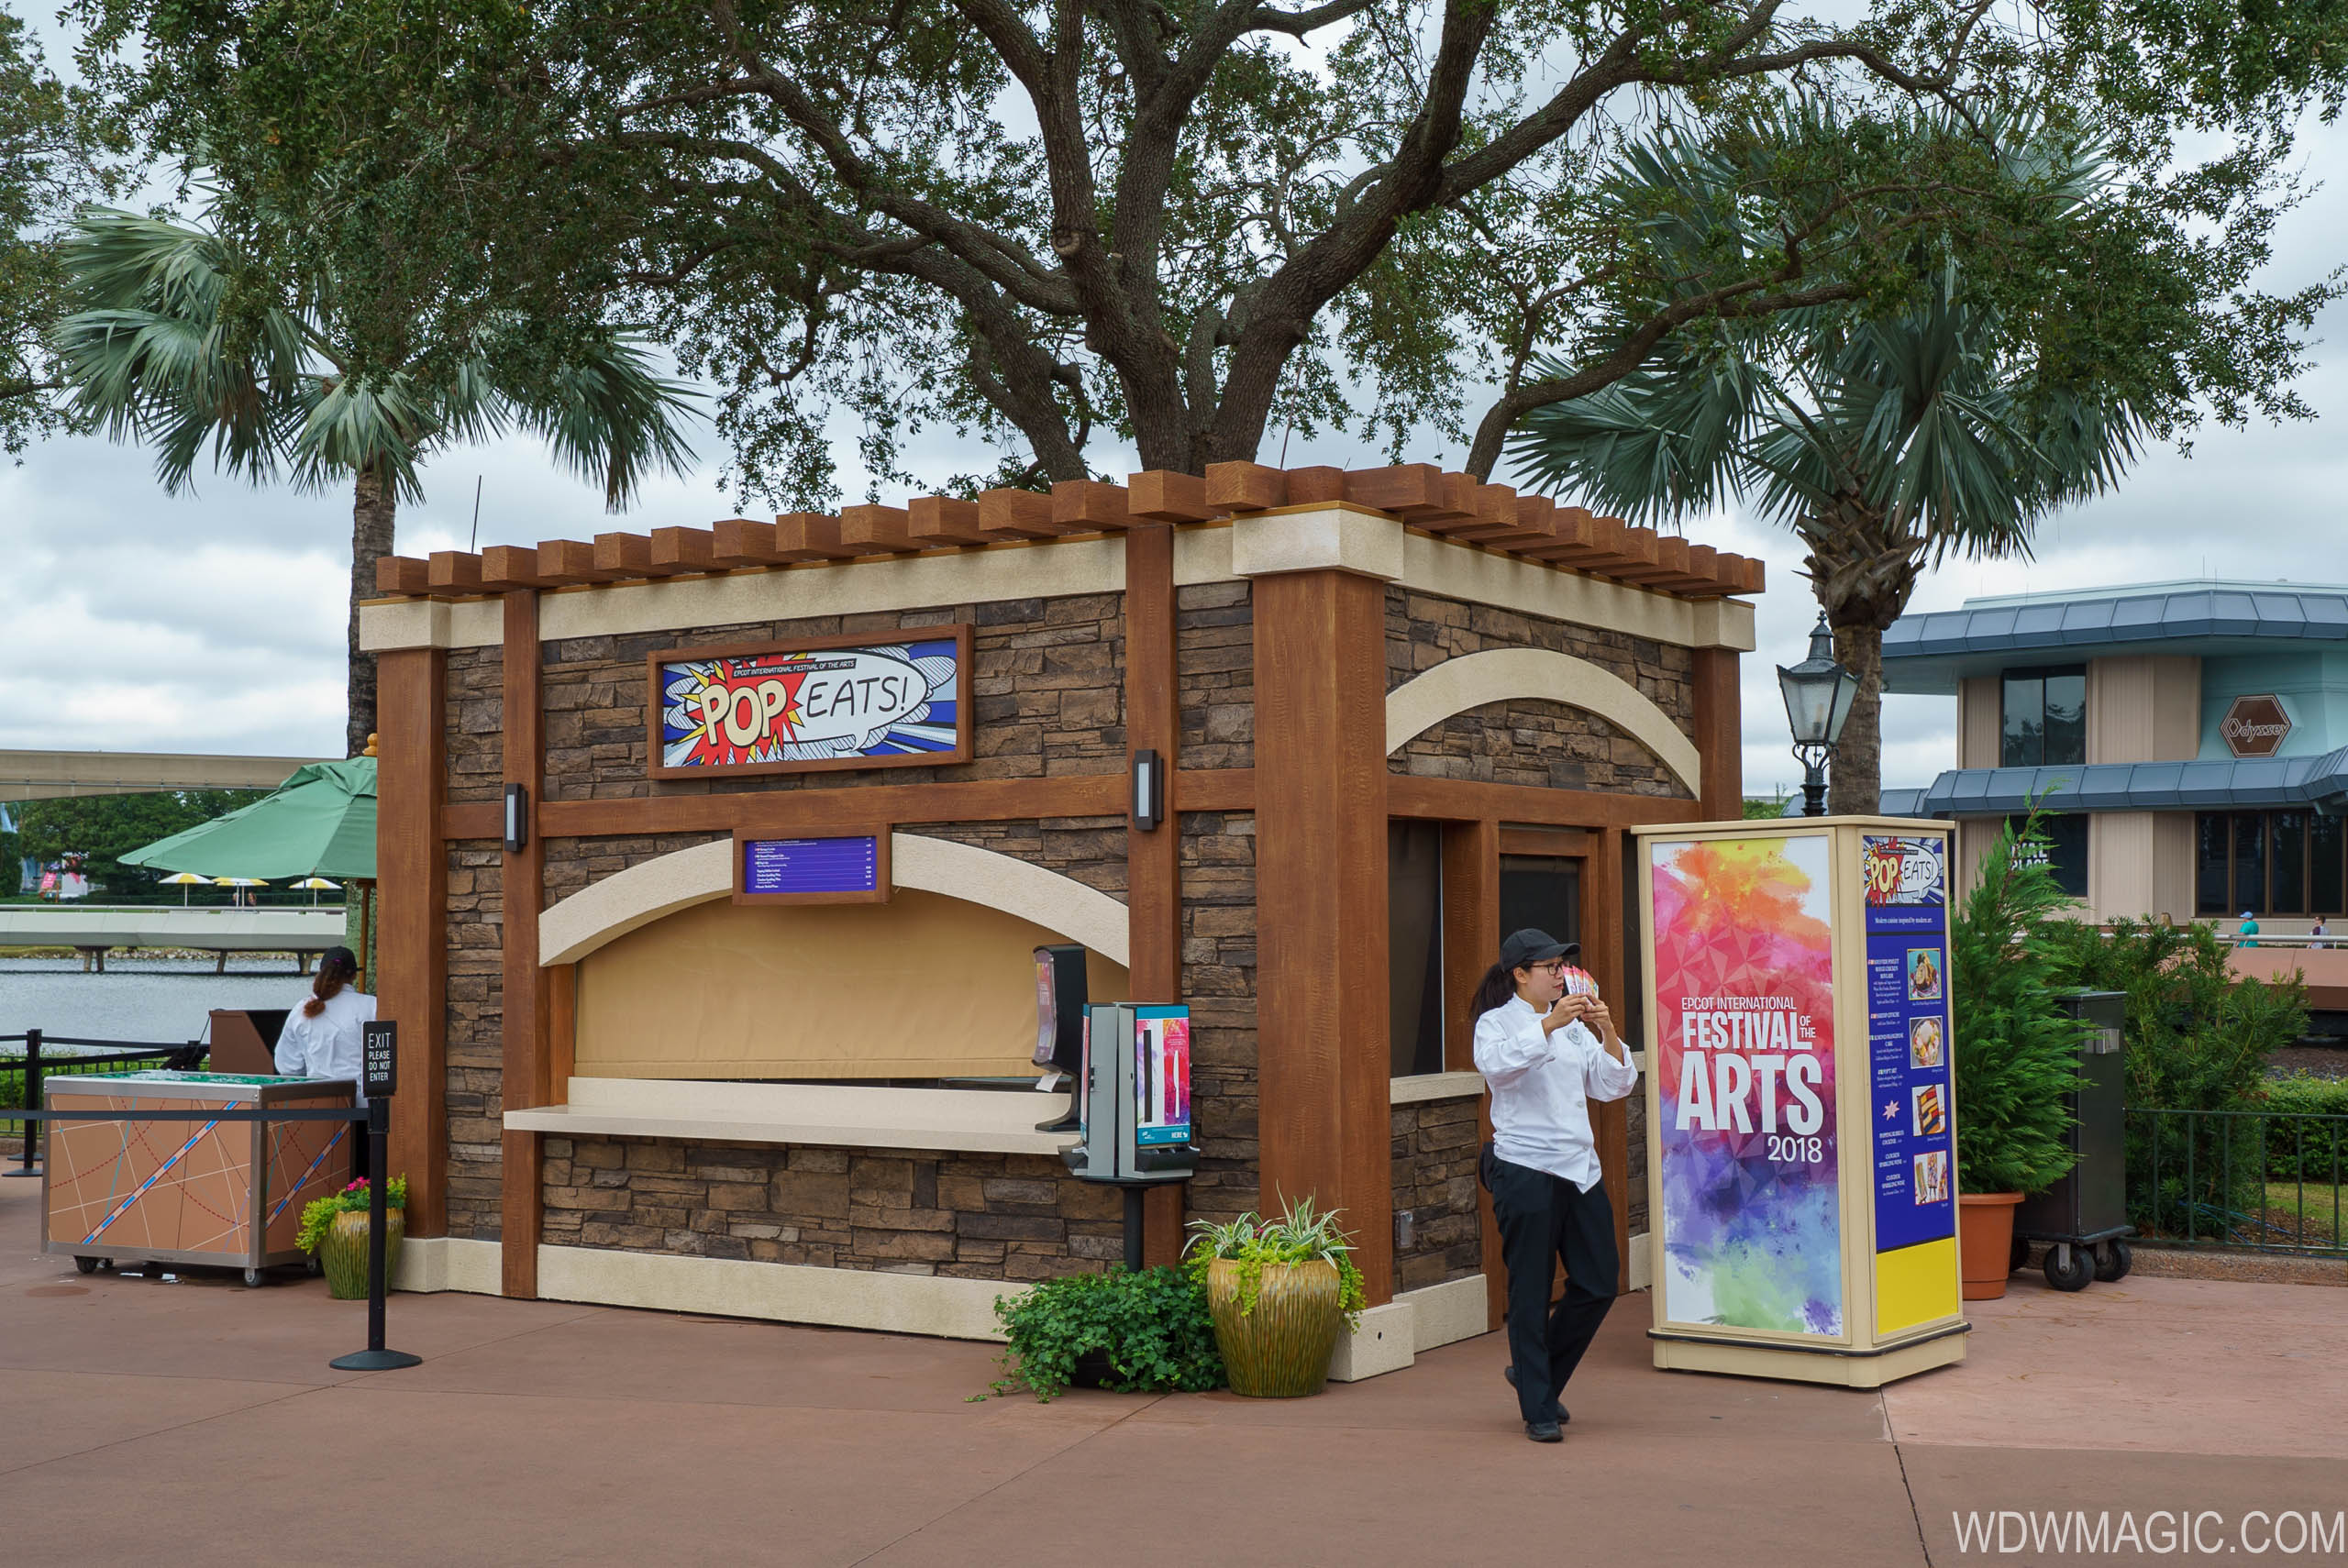 2018 Epcot Festival of the Arts Food Studio kiosks and menus